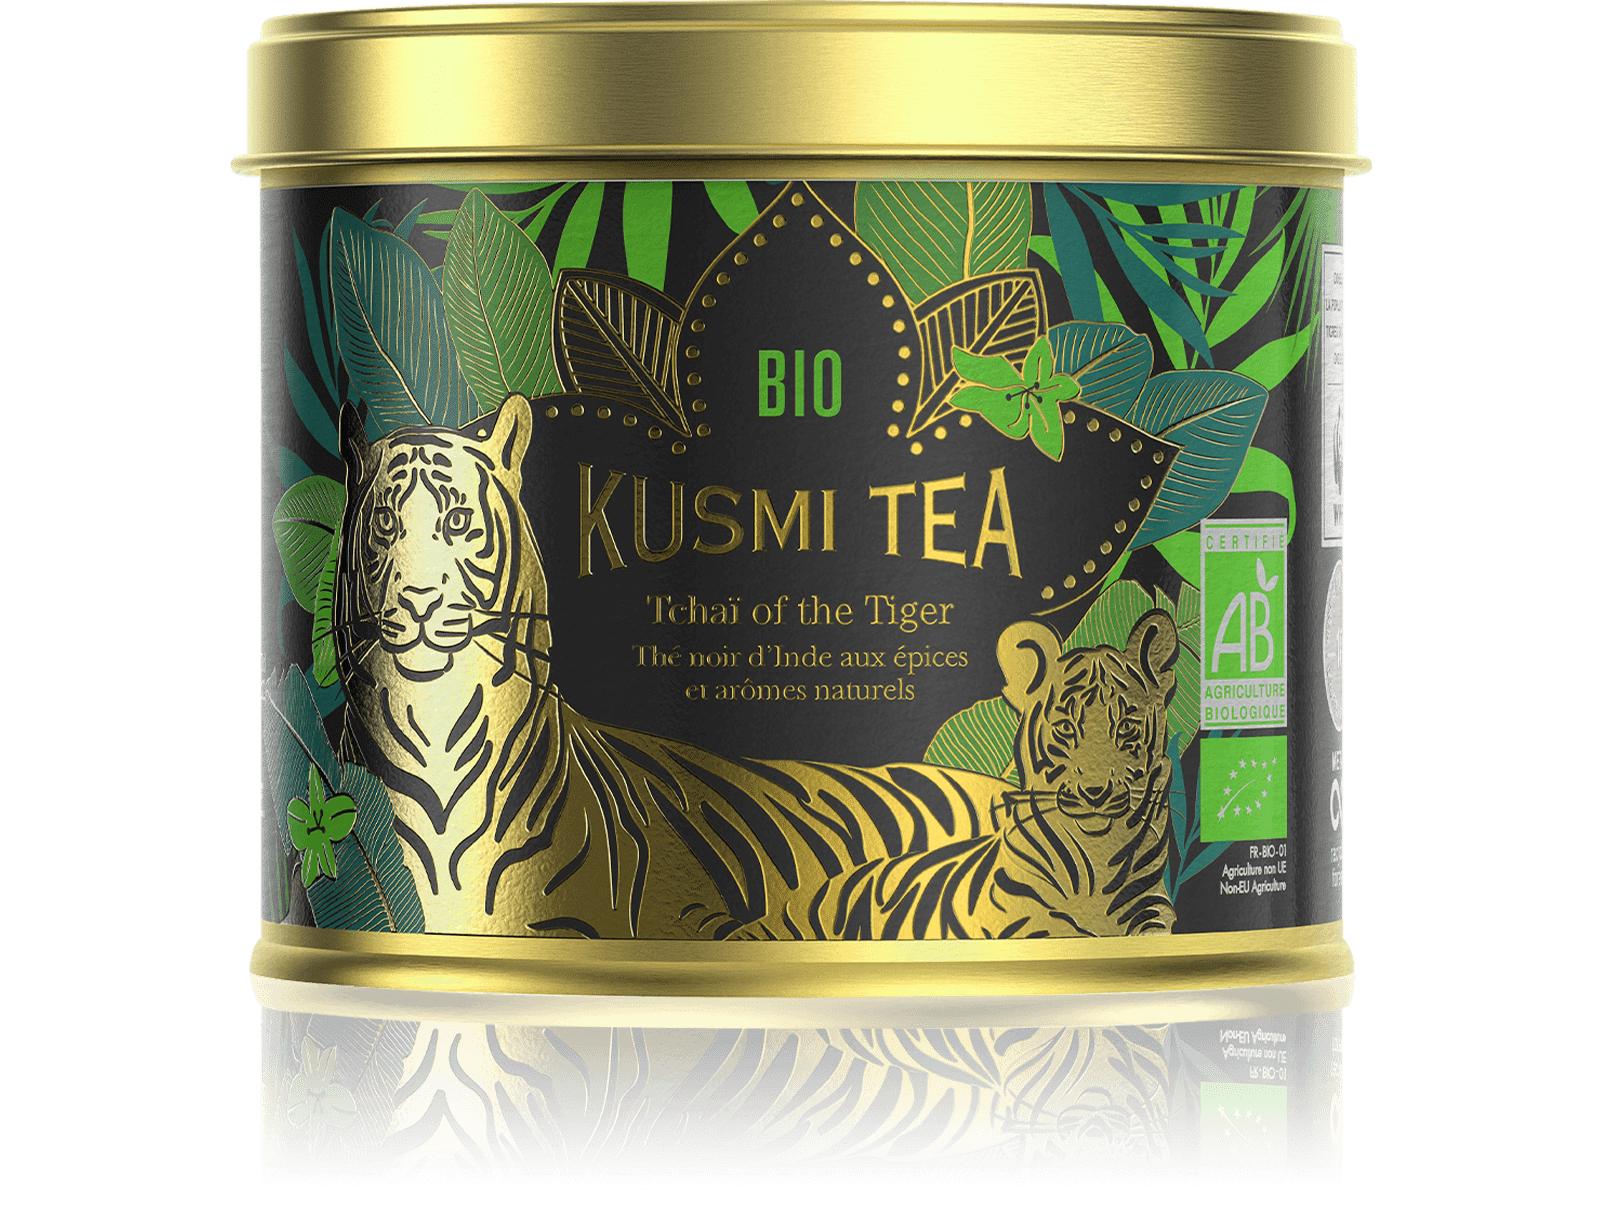 KUSMI TEA Tchaï of the Tiger Bio - Thé noir d'Inde aux épices - Kusmi Tea